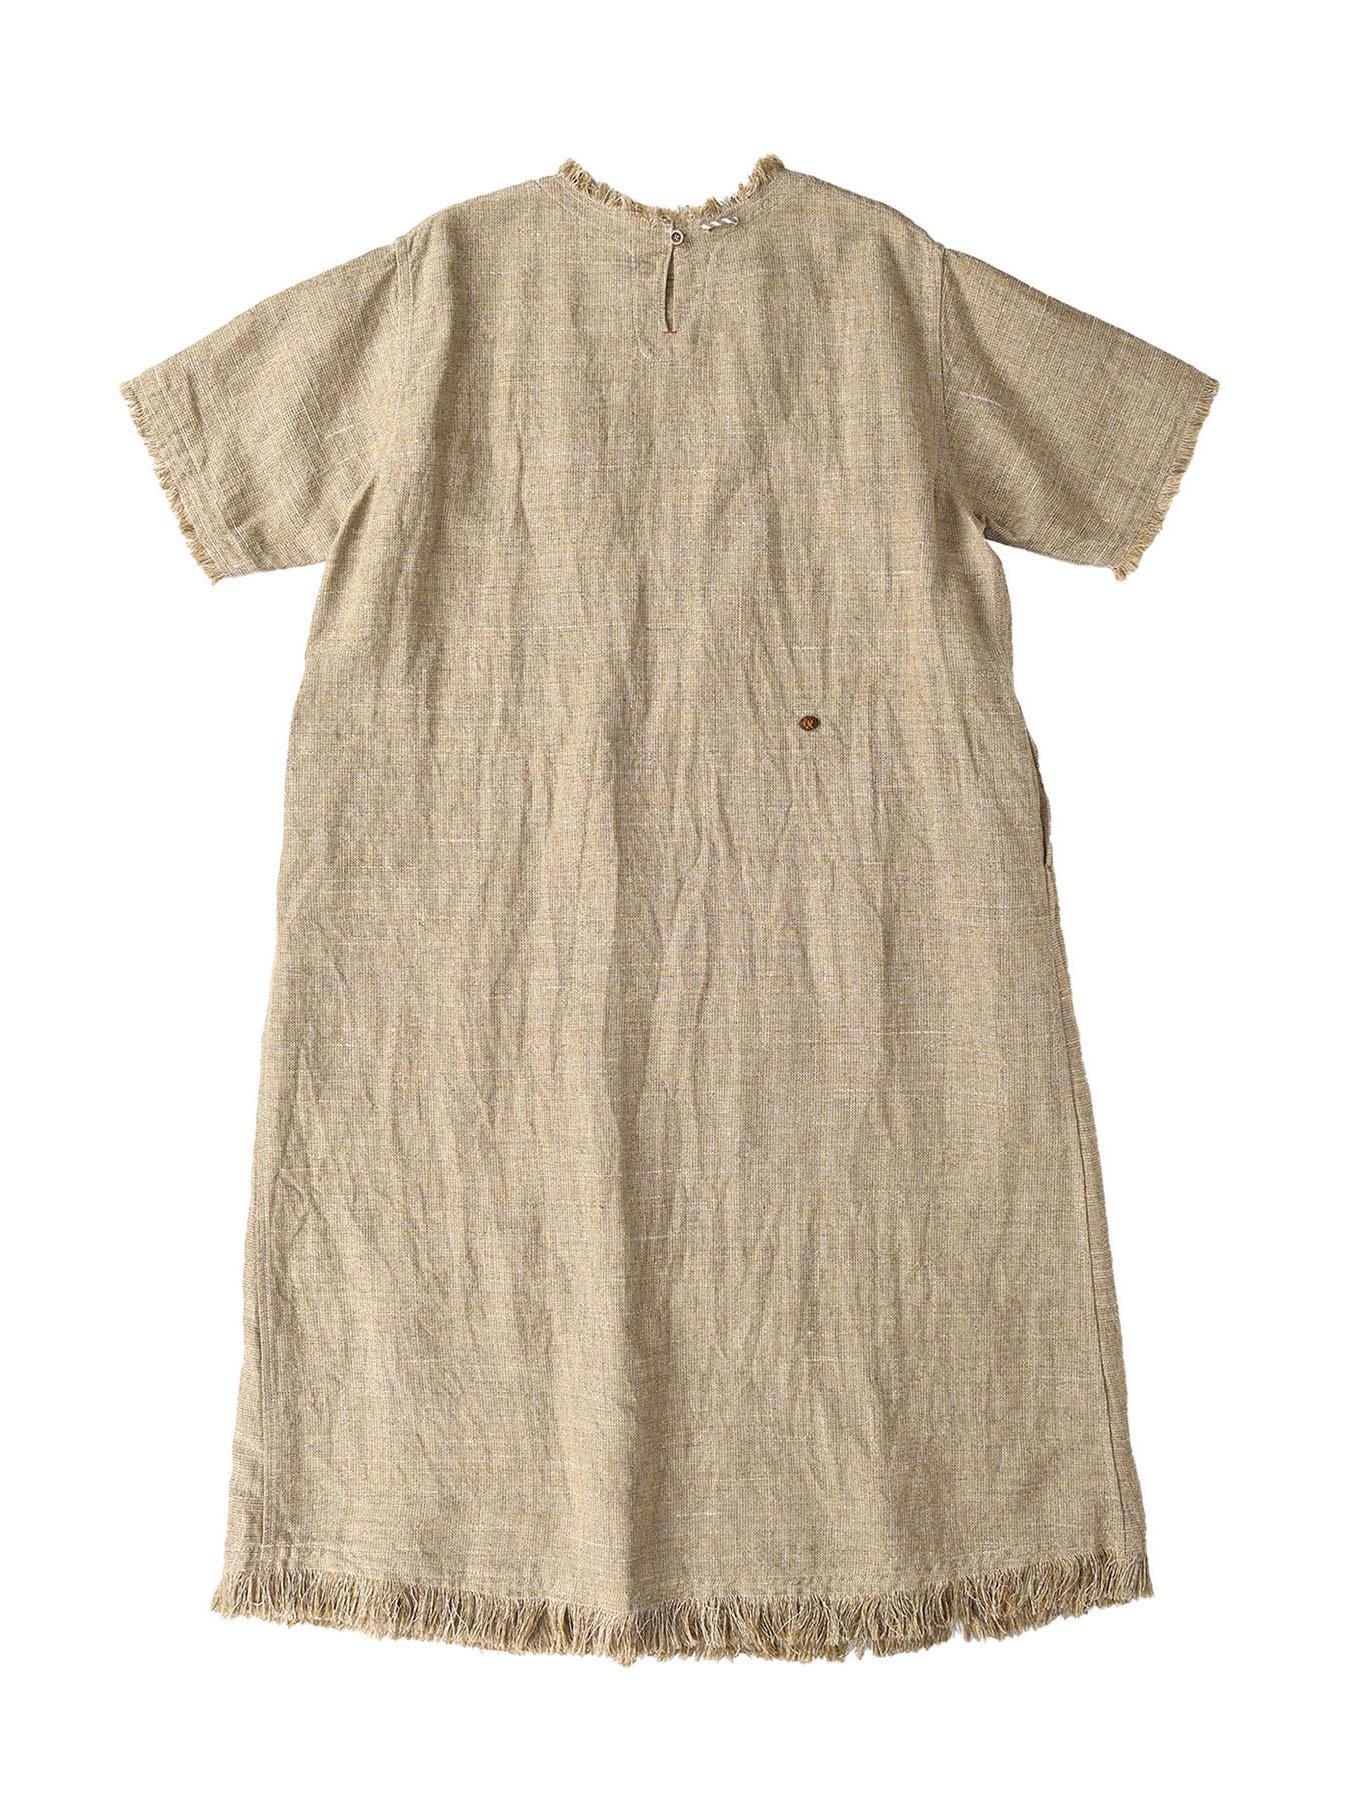 Gima Tweed Leilei Embroidery Dress-8